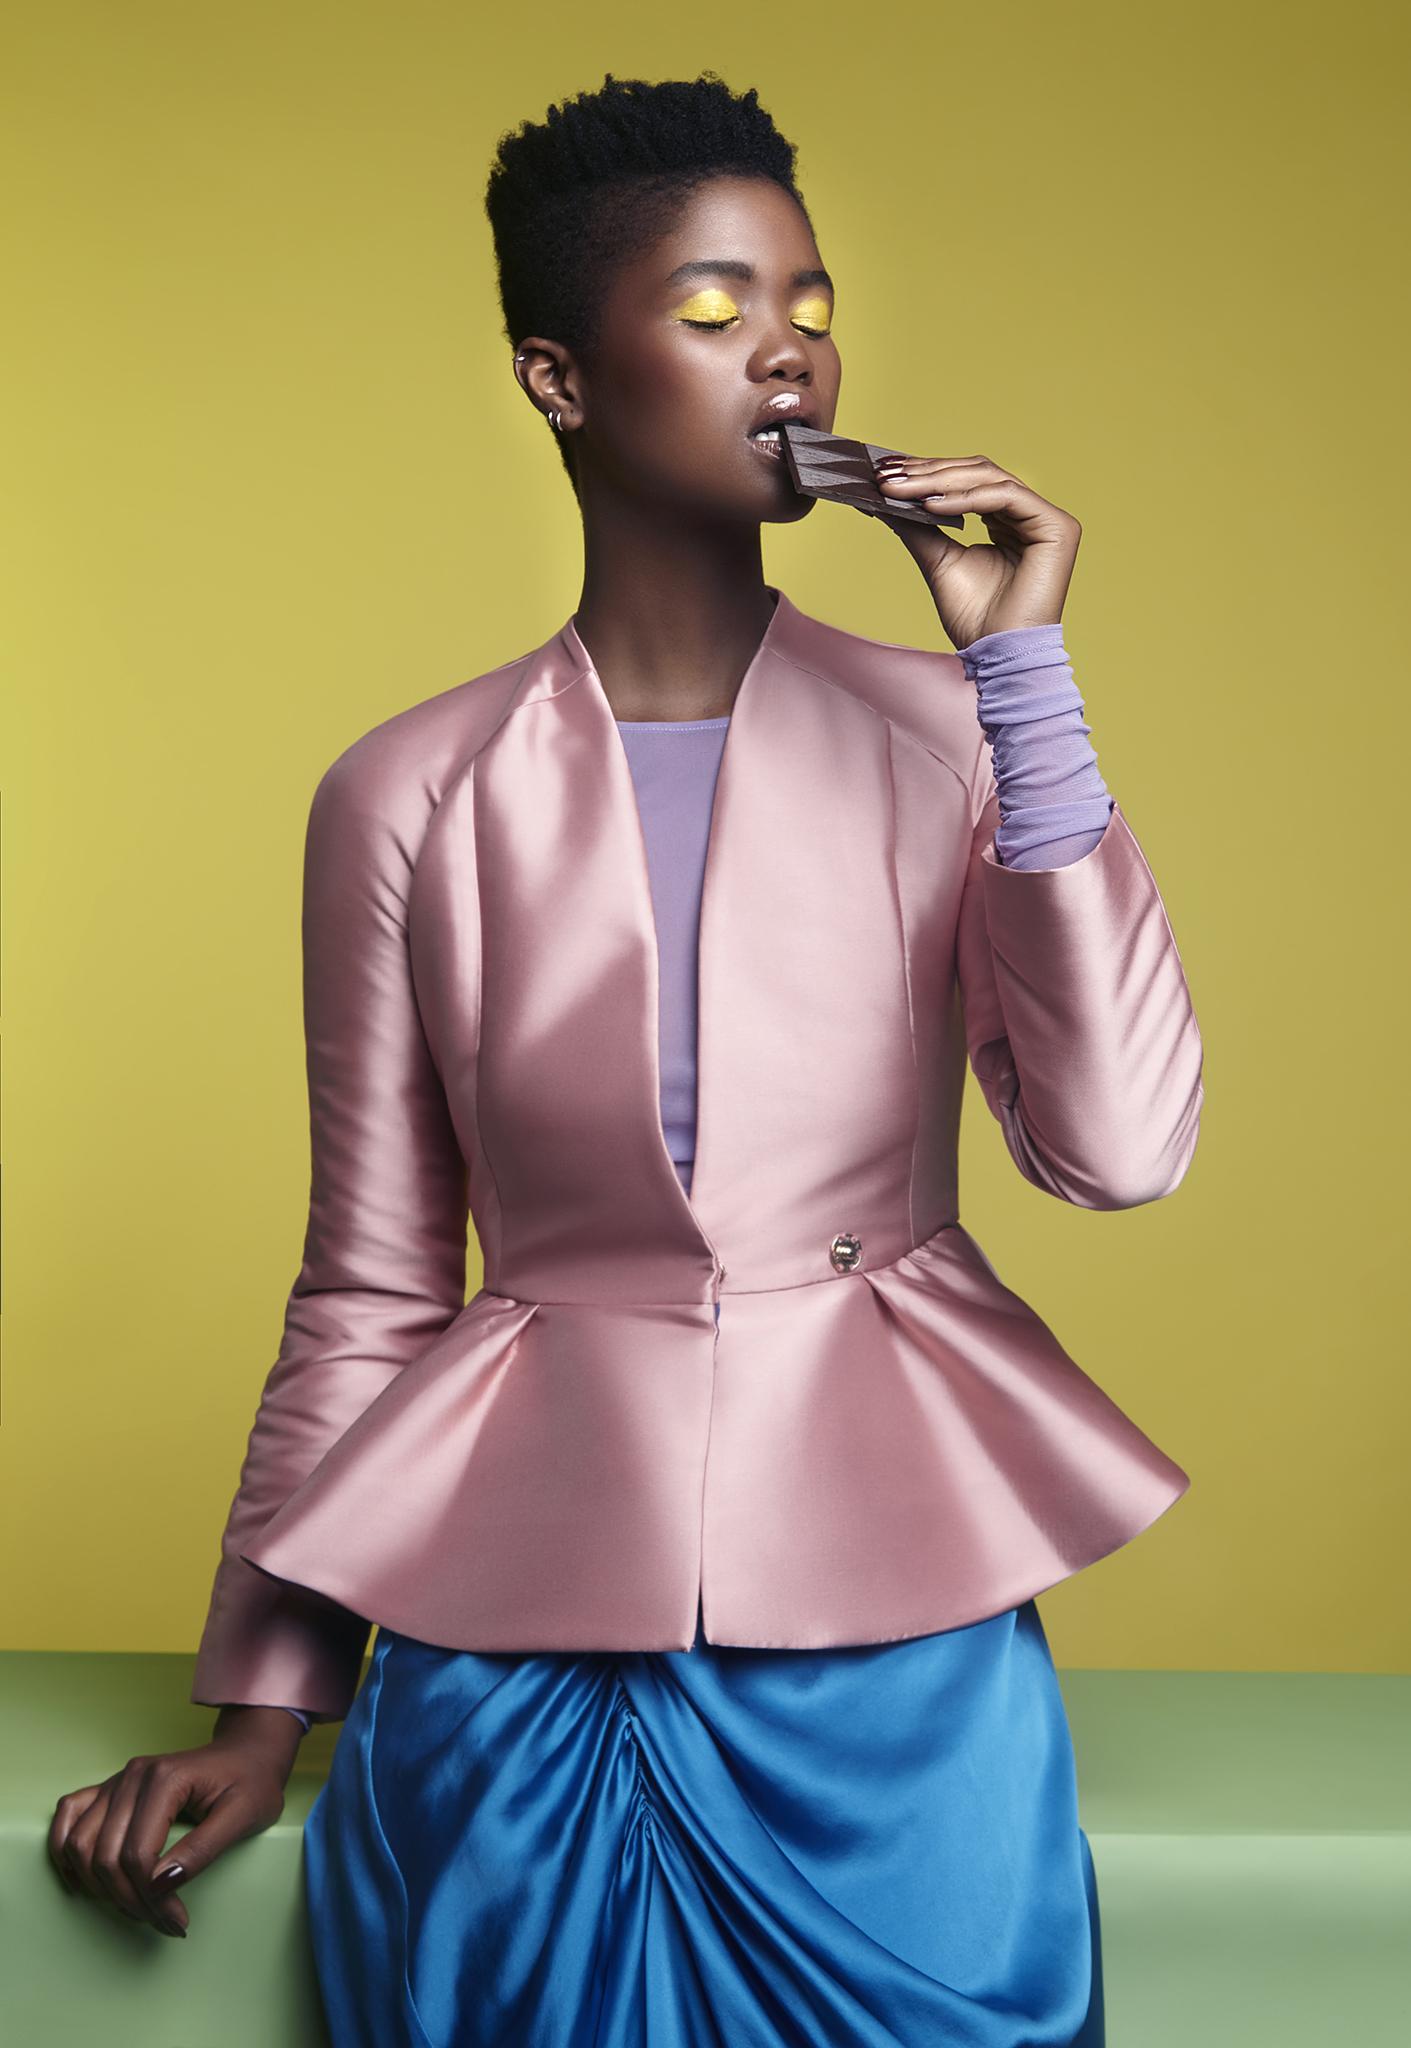 Colorful-Fashion-Editorial-Black-Model-by-Fashion-Photographer-Dana-Cole-Fashion-Styling-pink-jacket.jpg